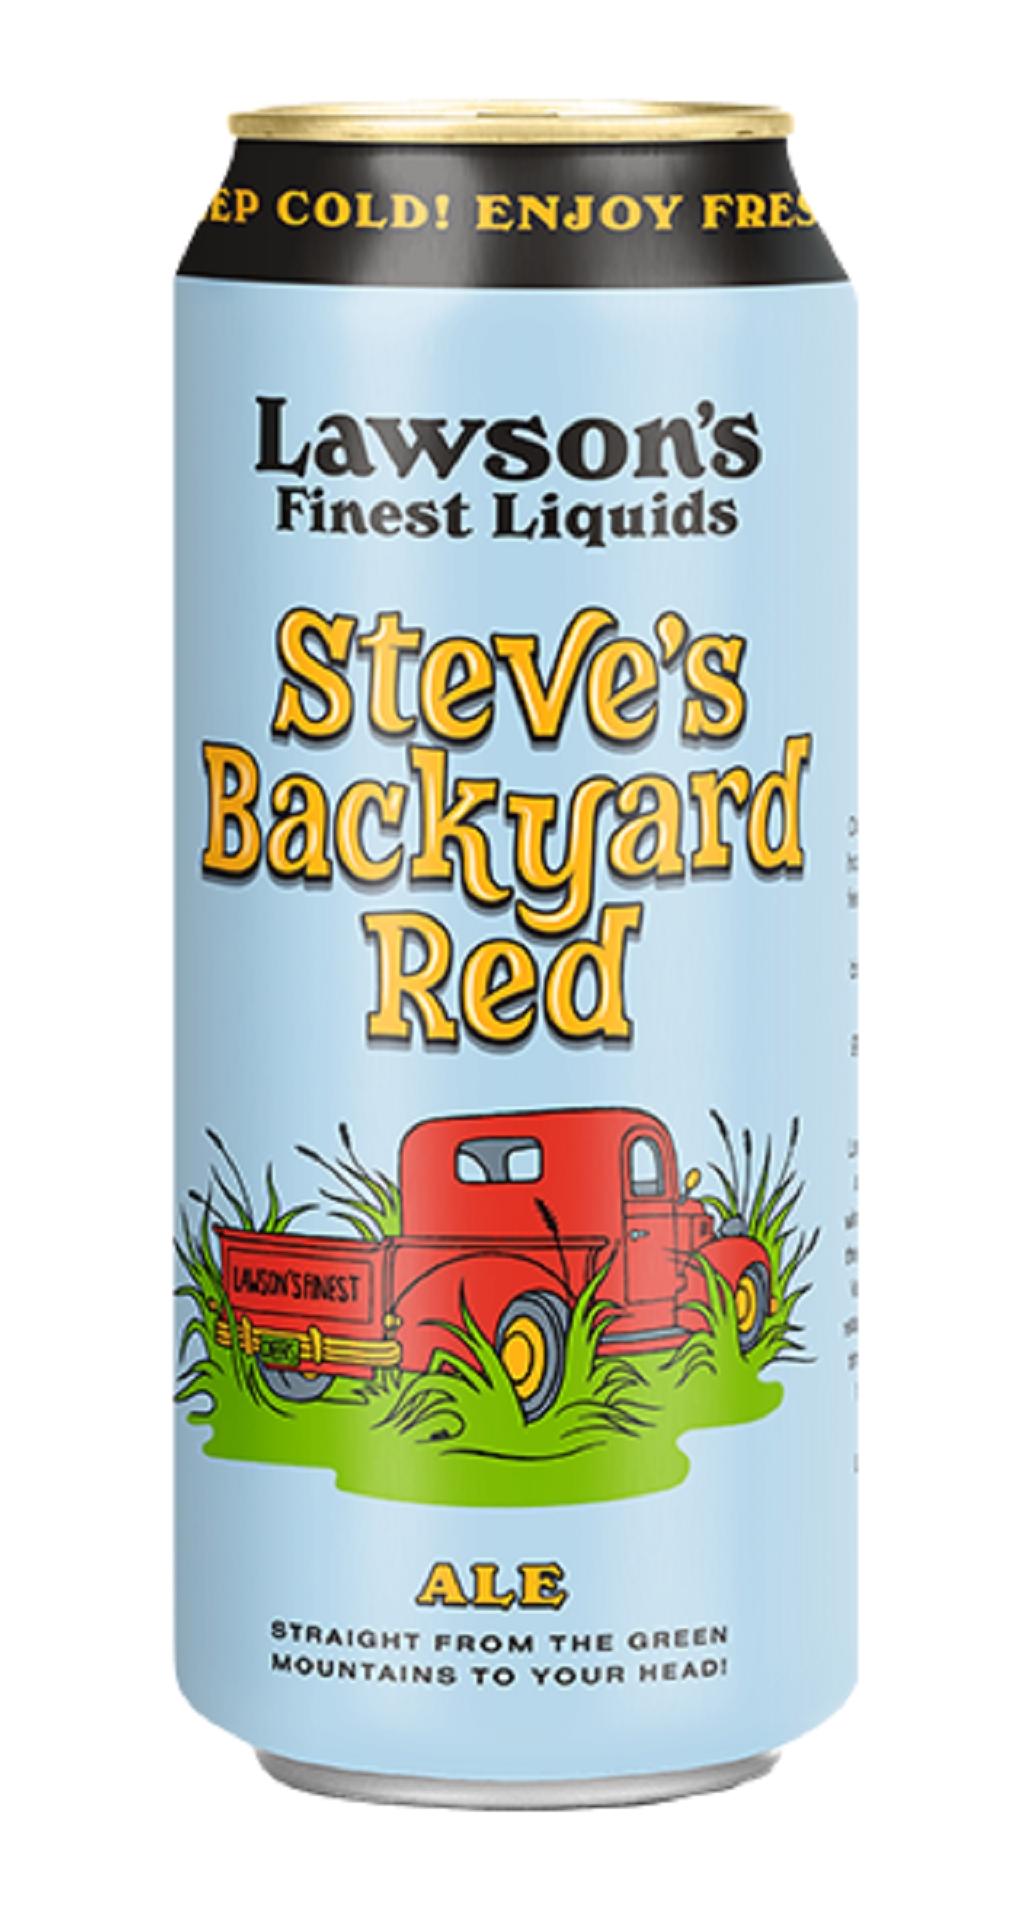 Steves Backyard Red Ale